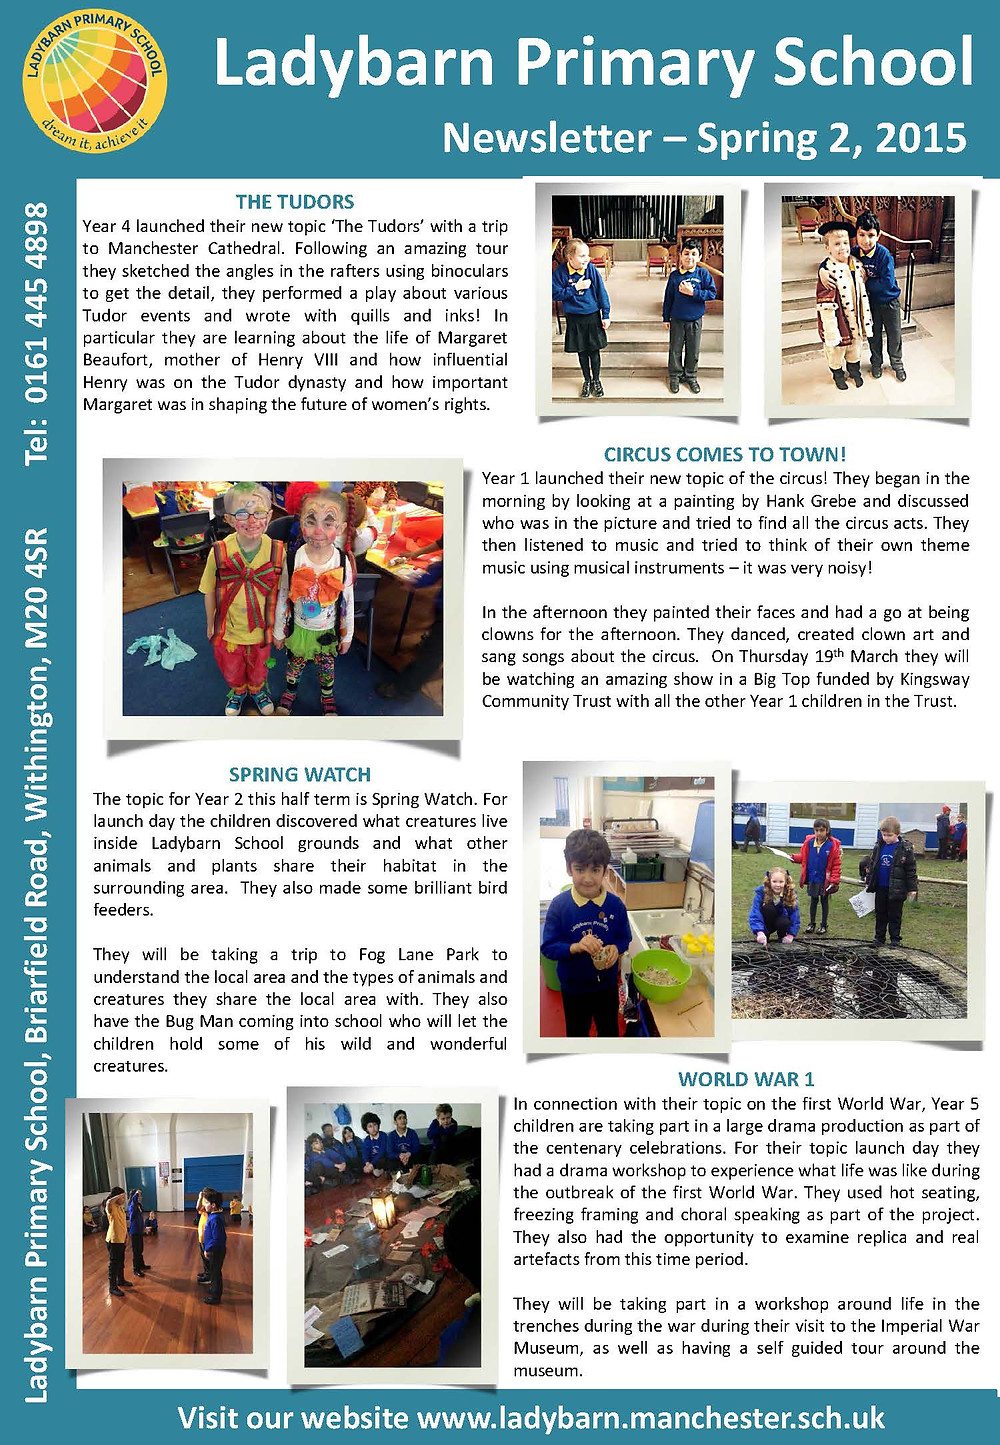 LB Newsletter Spring 2 2015_Page_1.jpg